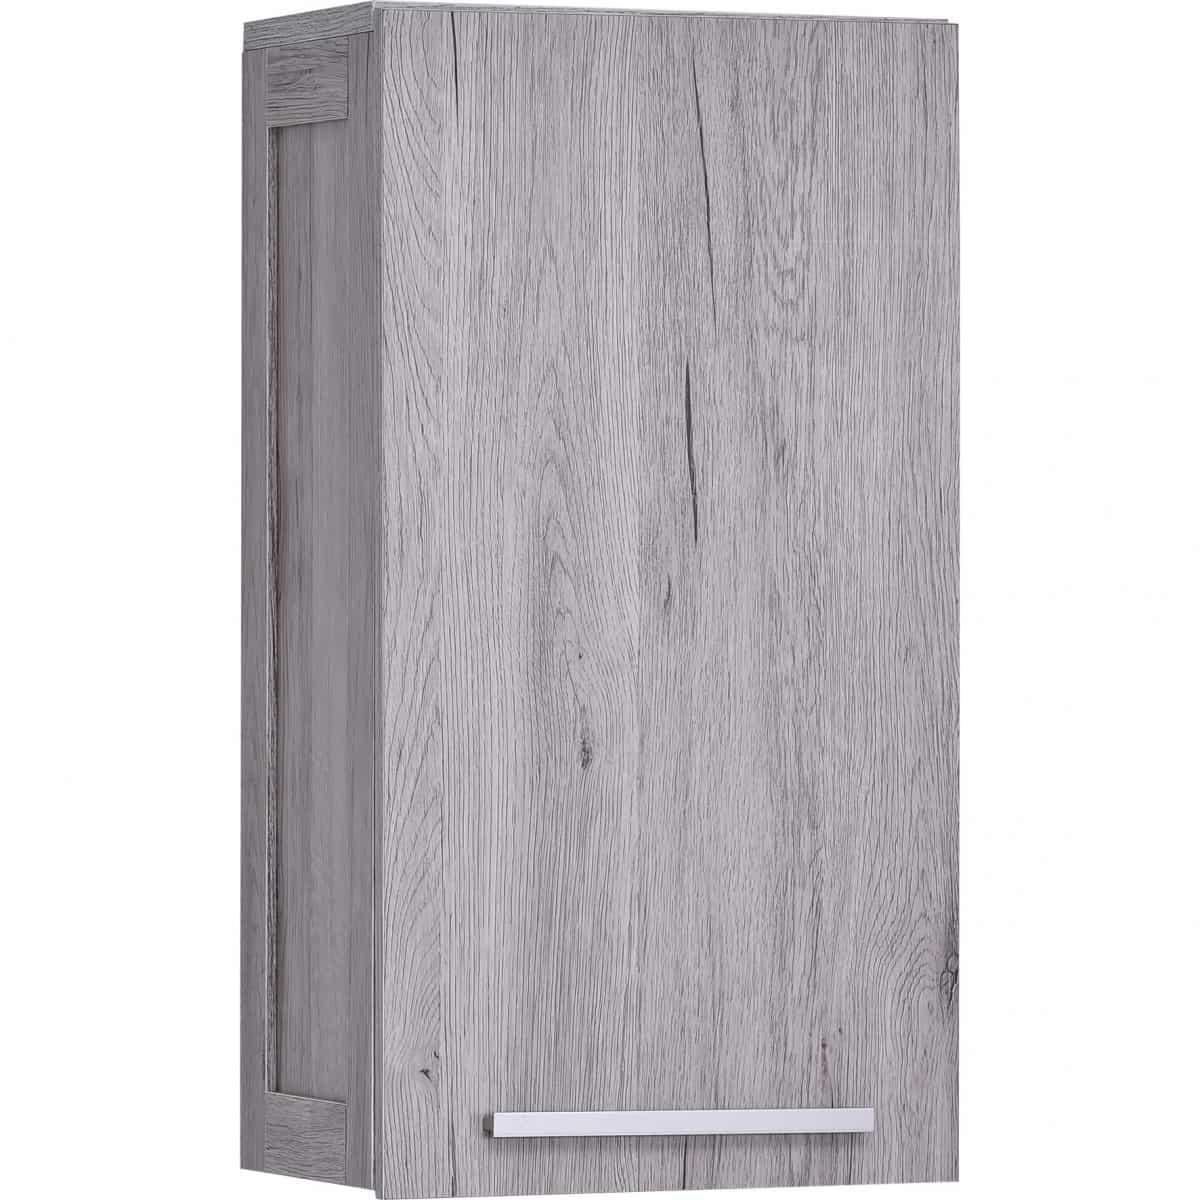 Wall Mounted Bath Cabinet Oslo 1 Door 1 Shelf Washed Gray Oak